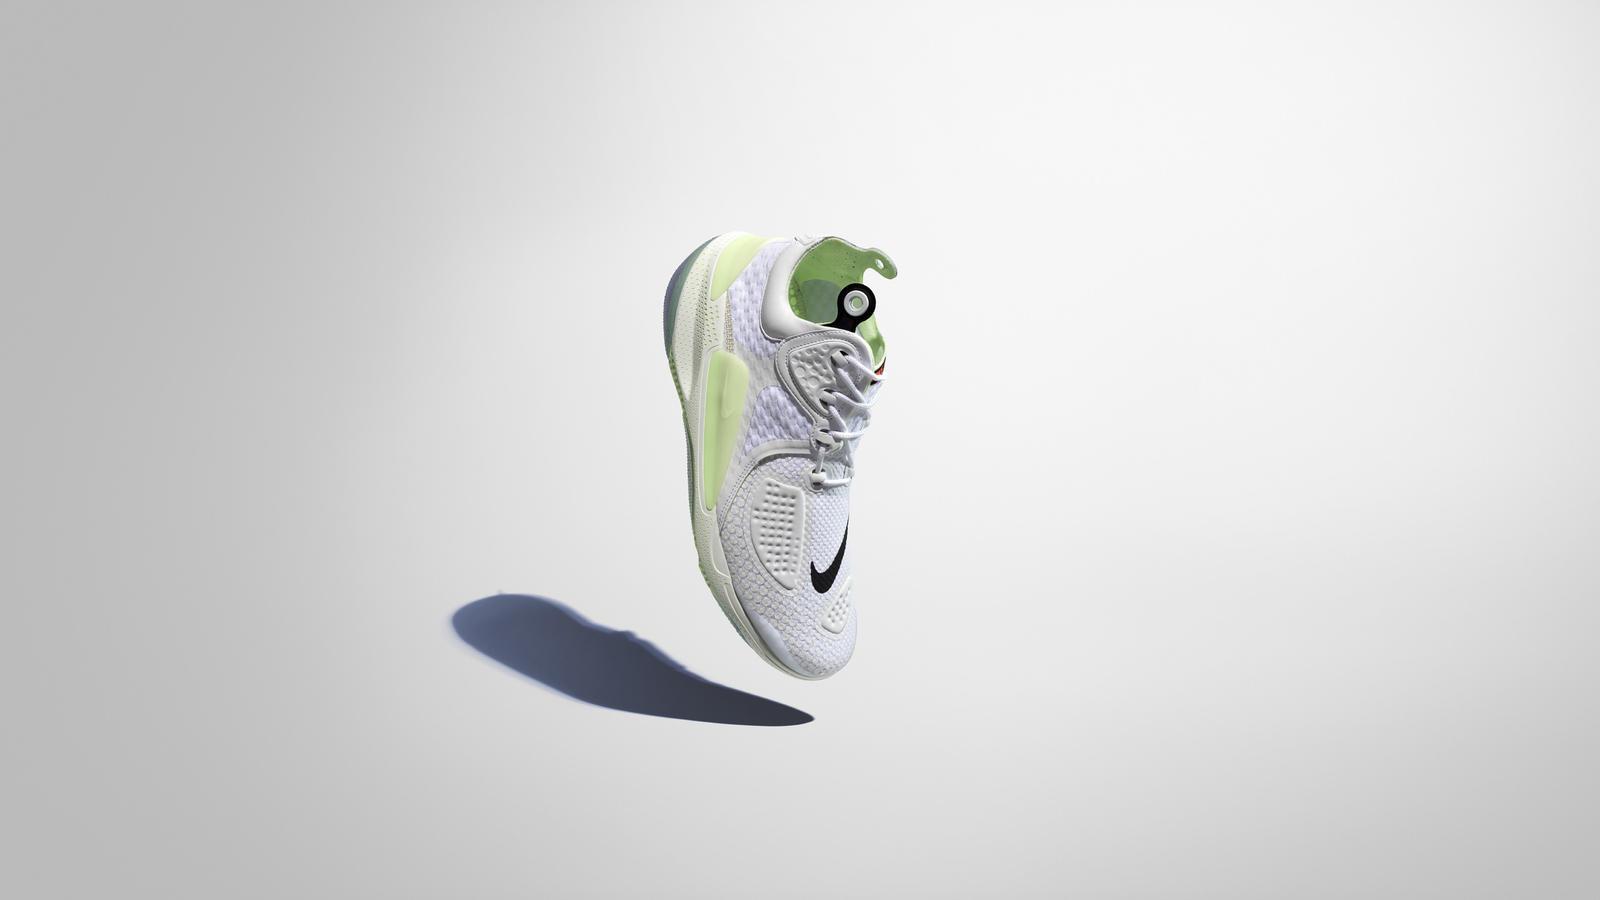 Nike Joyride NSW Setter Official Images